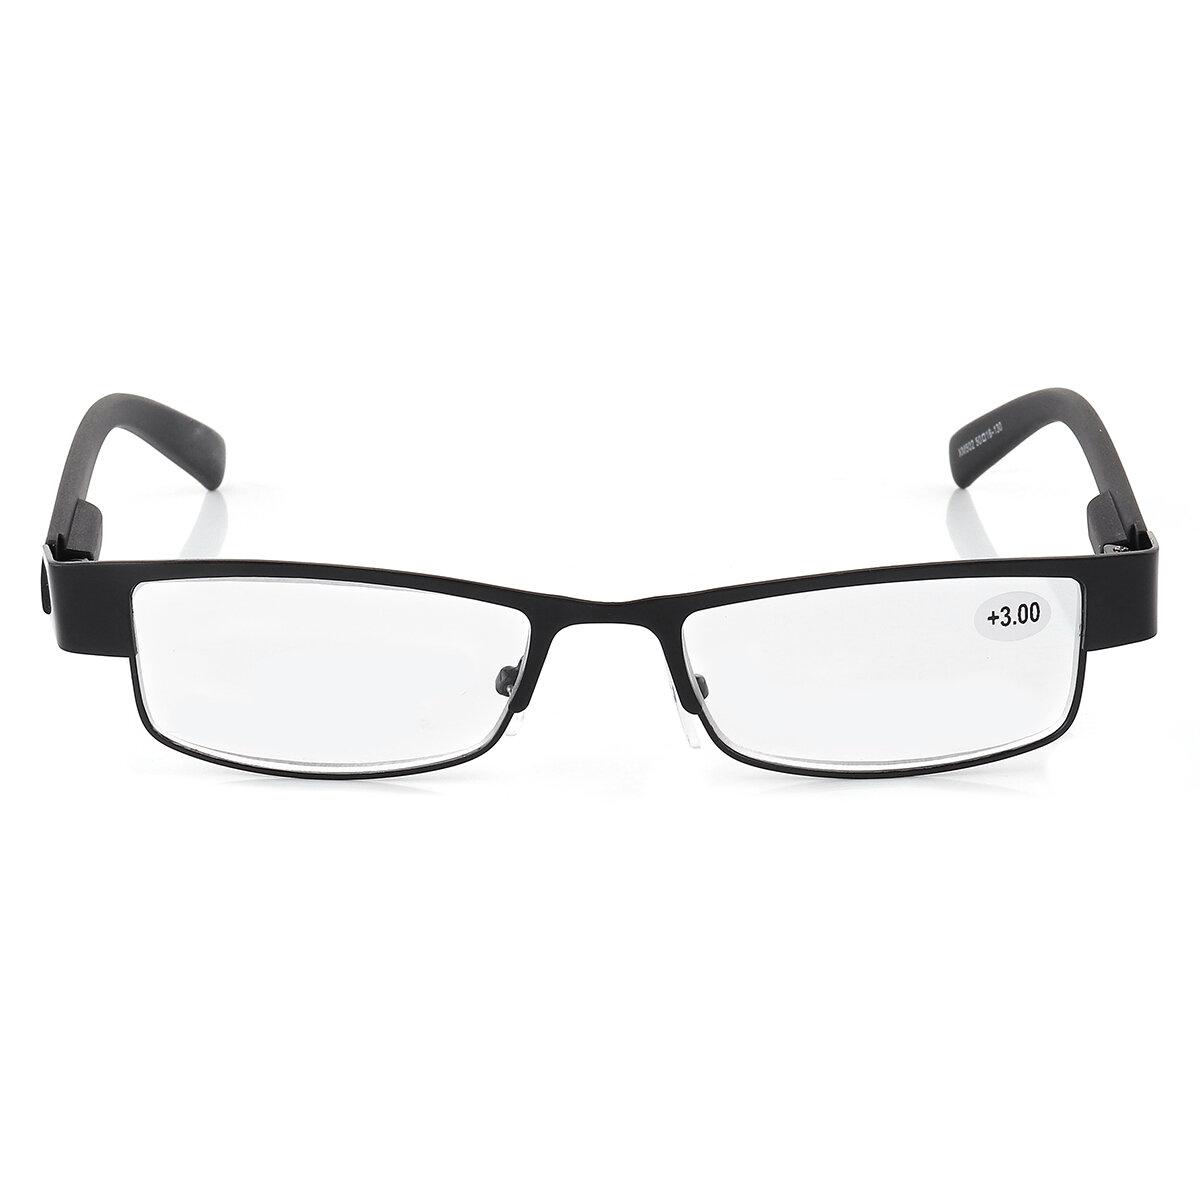 KCASA Metal Frame Anti Fadiga Presbiopia Melhor Leitura Óculos Força Magnifier